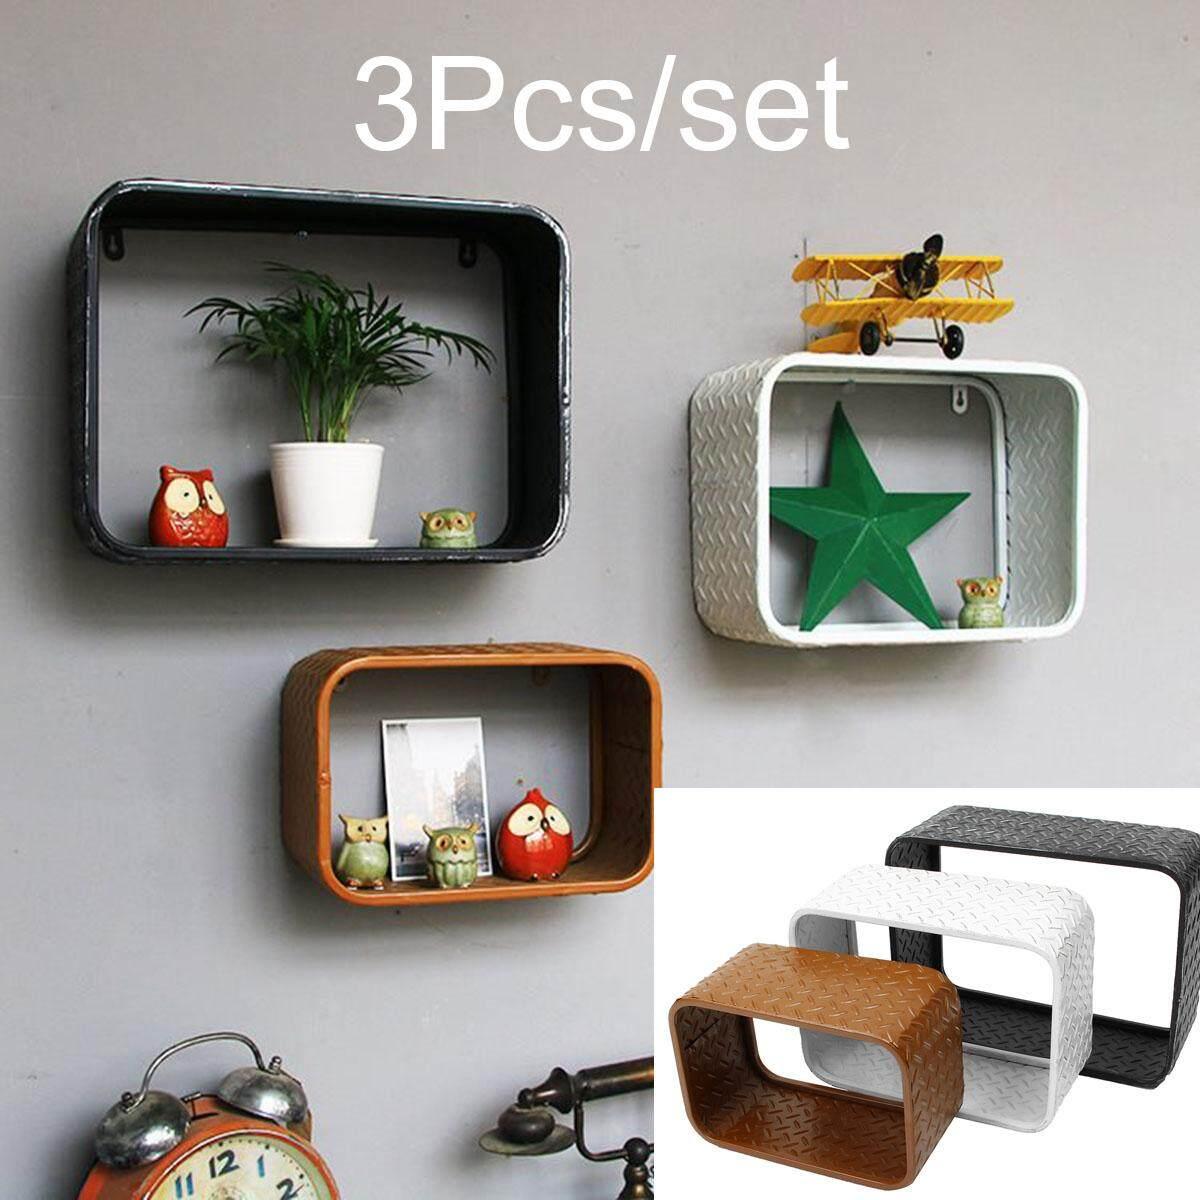 3x Industrial Vintage Floating Shelf Shelving Racks Storage Wall Cabinet Units - intl